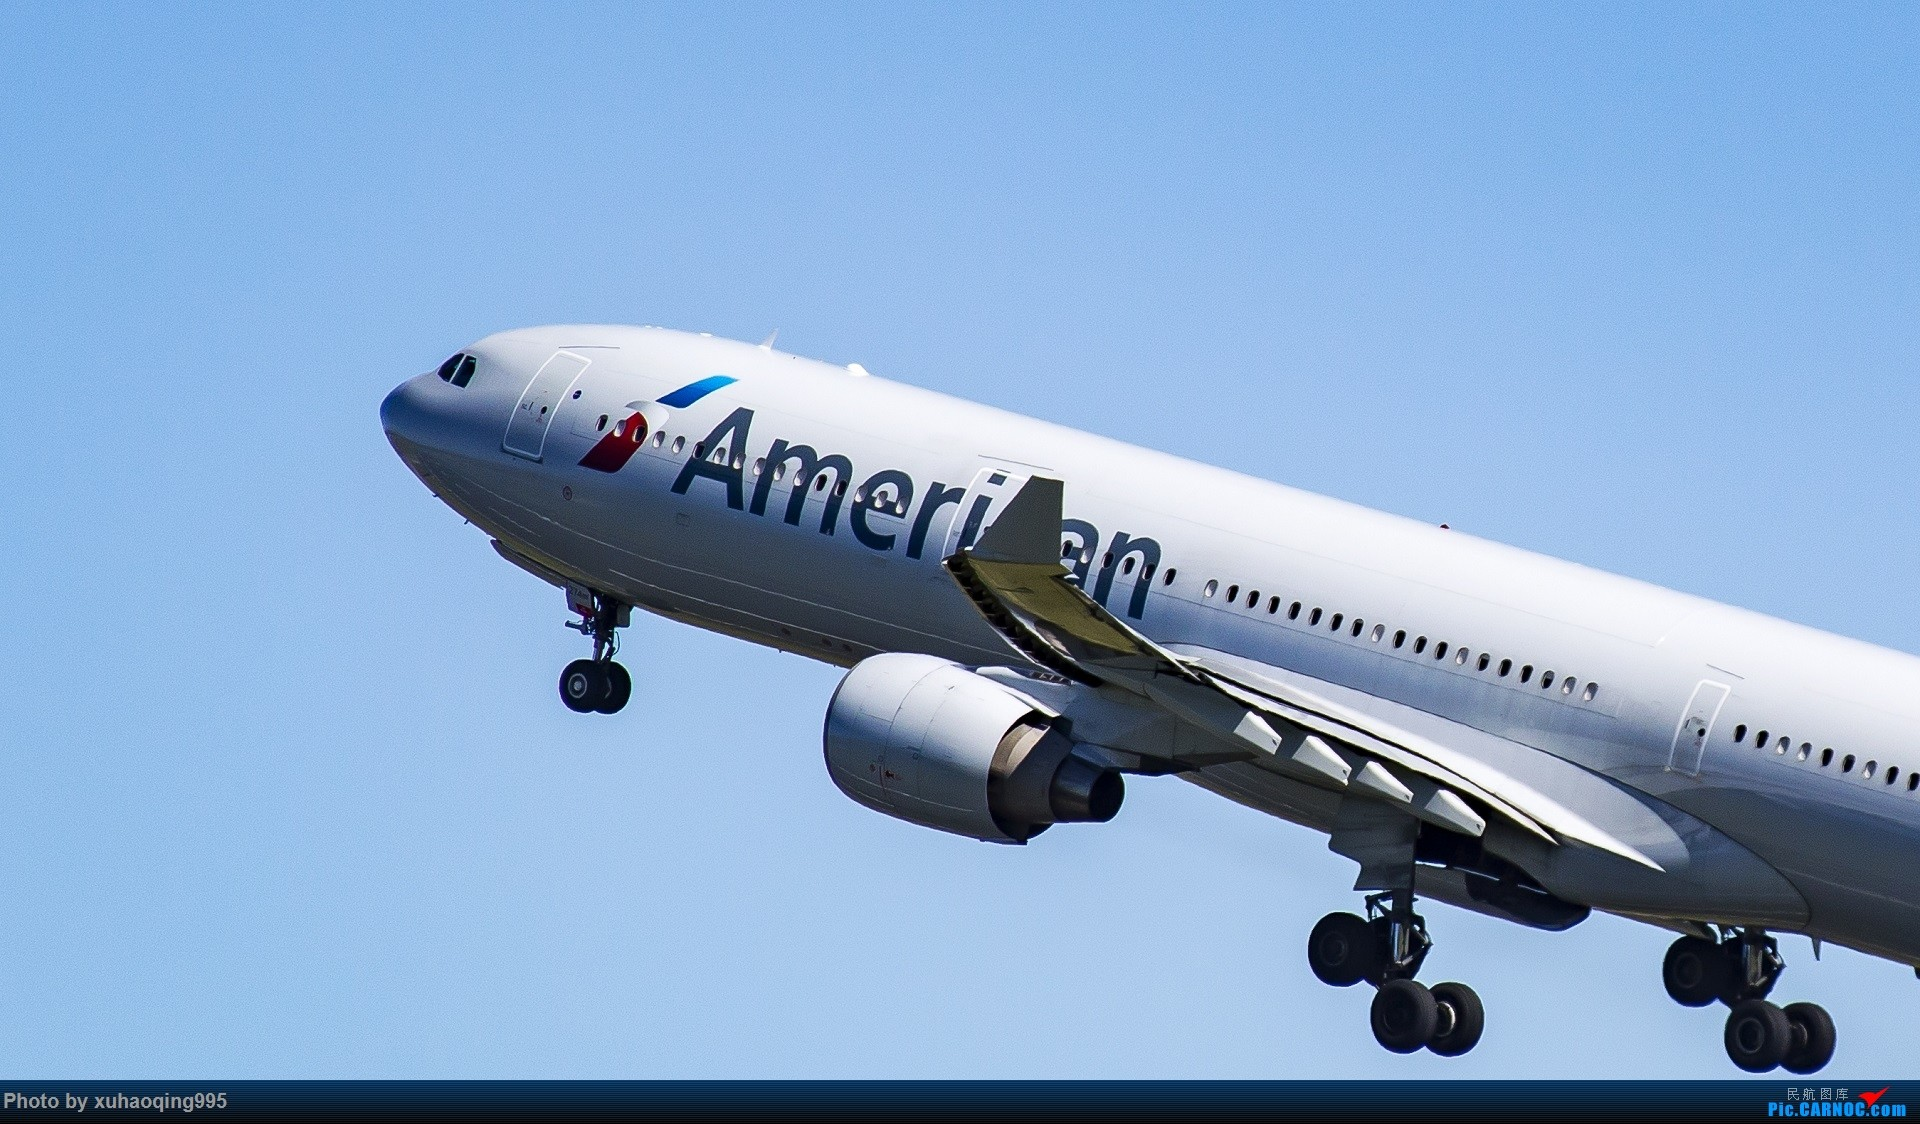 Re:[原创]罗马机场(FCO)拍机 AIRBUS A330-300 N274AY 意大利菲乌米奇诺机场